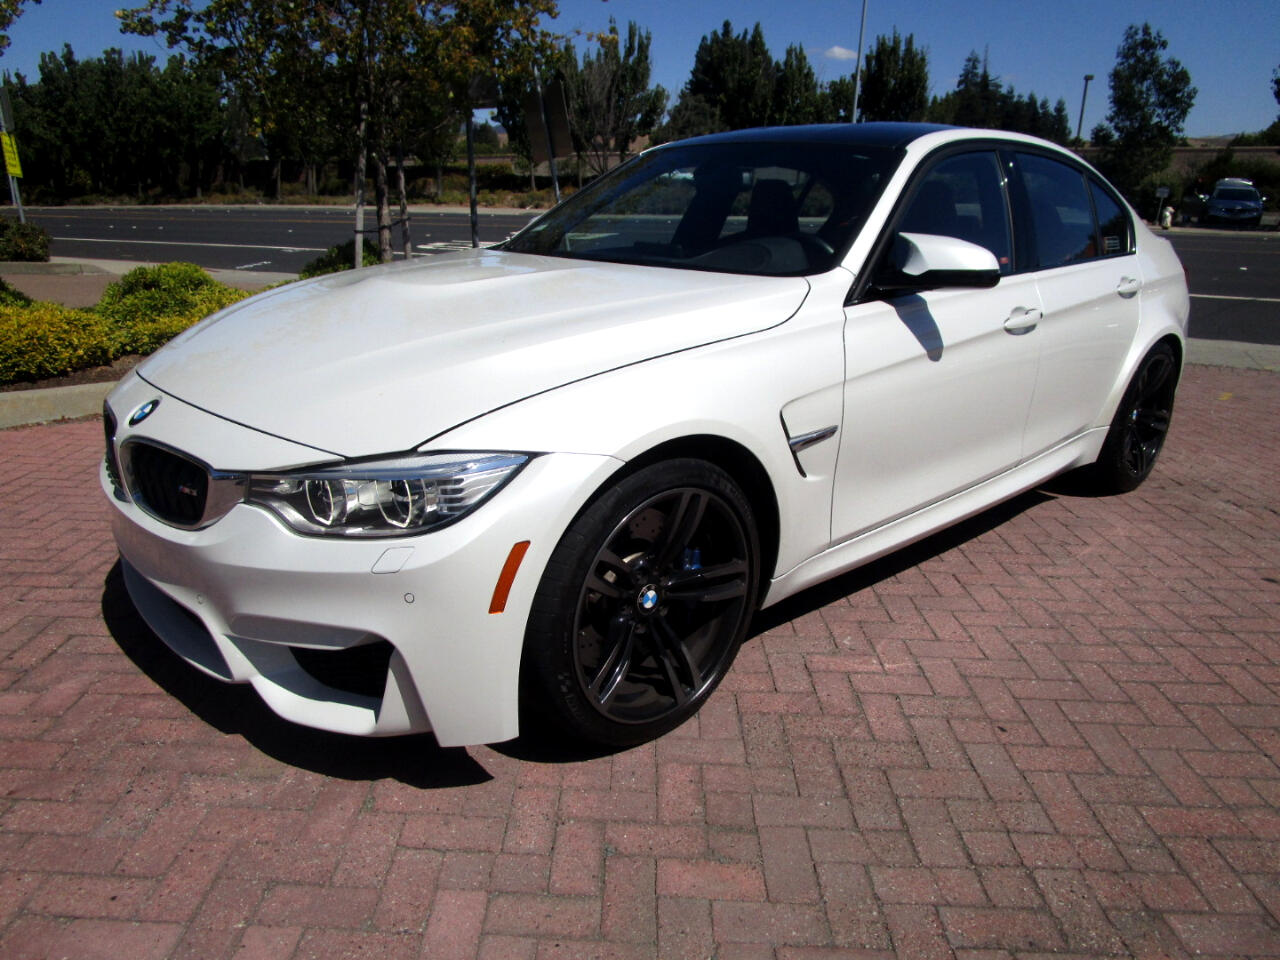 2015 BMW M3 TWIN TURBO**EXEC PKG*HEADS-UP*HEAT SEATS/STR WHEEL